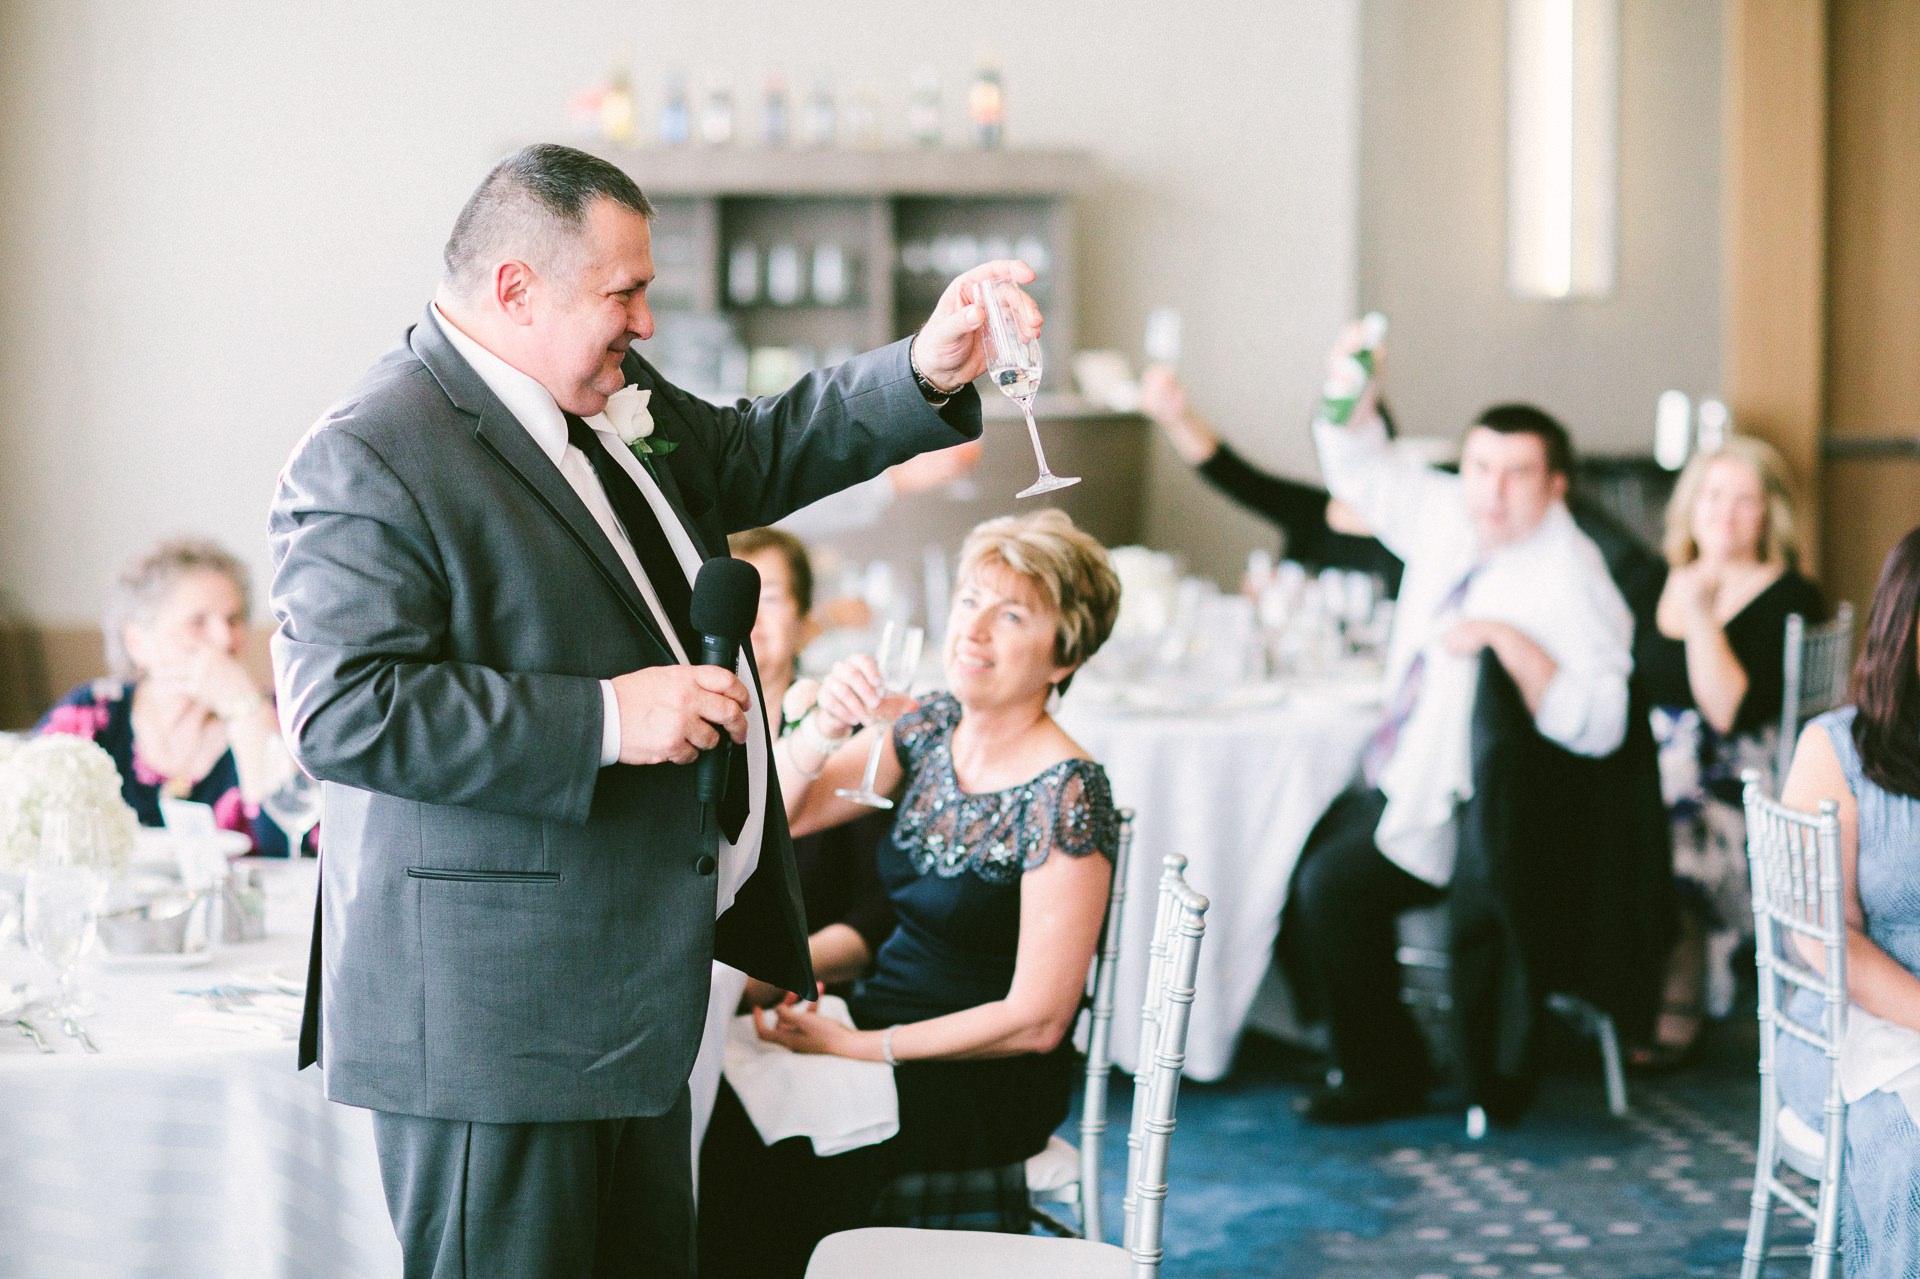 Dowtown Hilton Cleveland Wedding Photographer 2 29.jpg